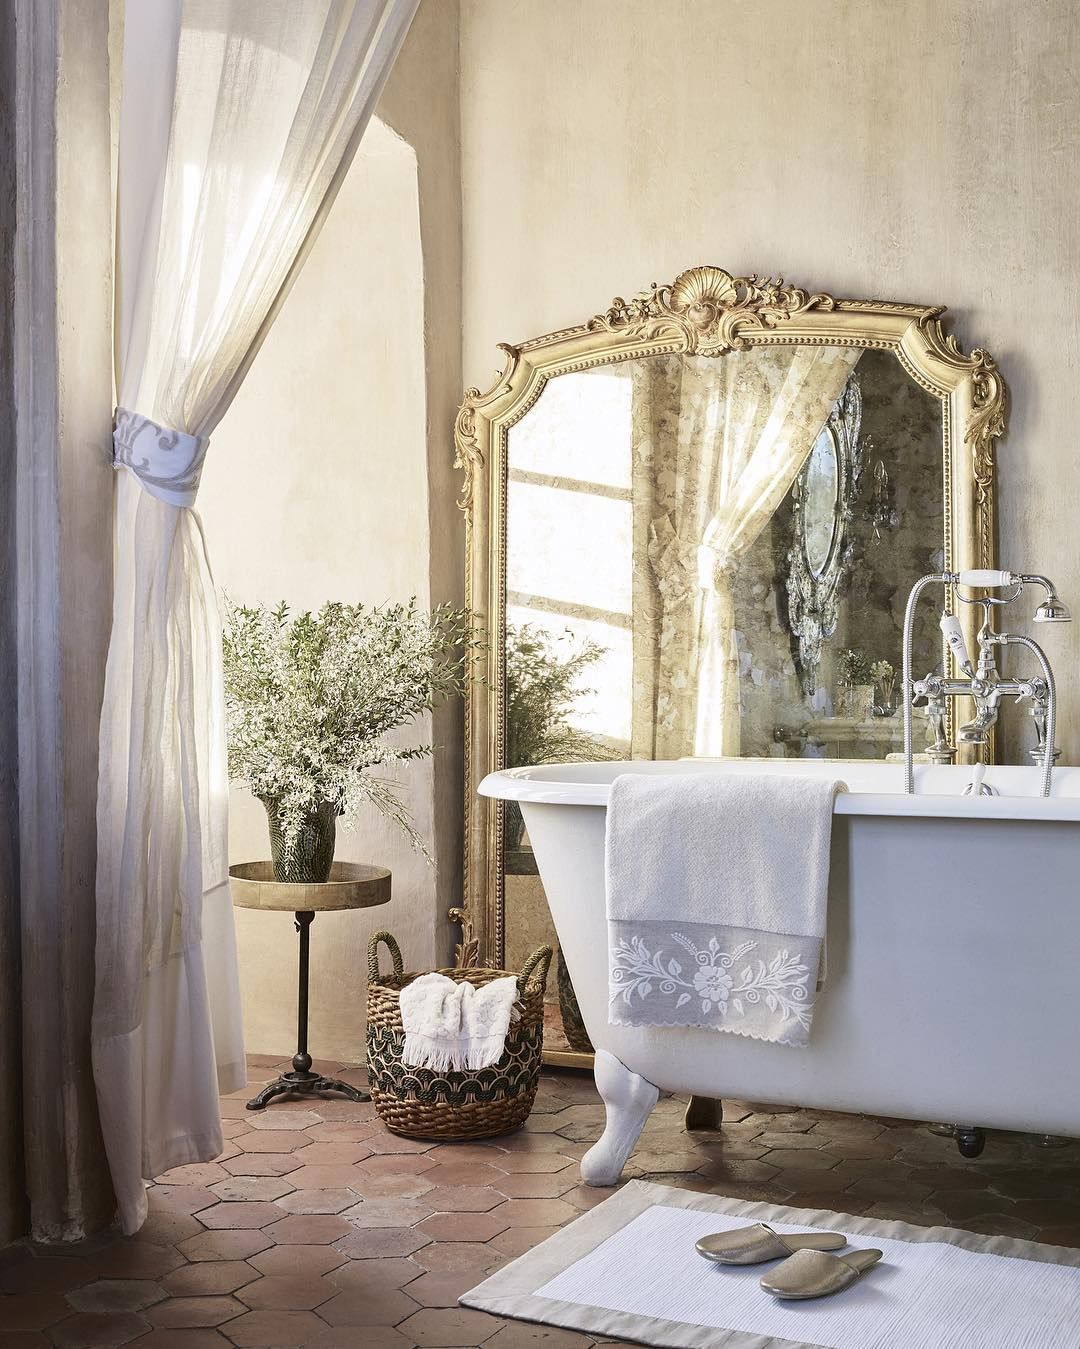 Top Image Bathroom Sofa Zara